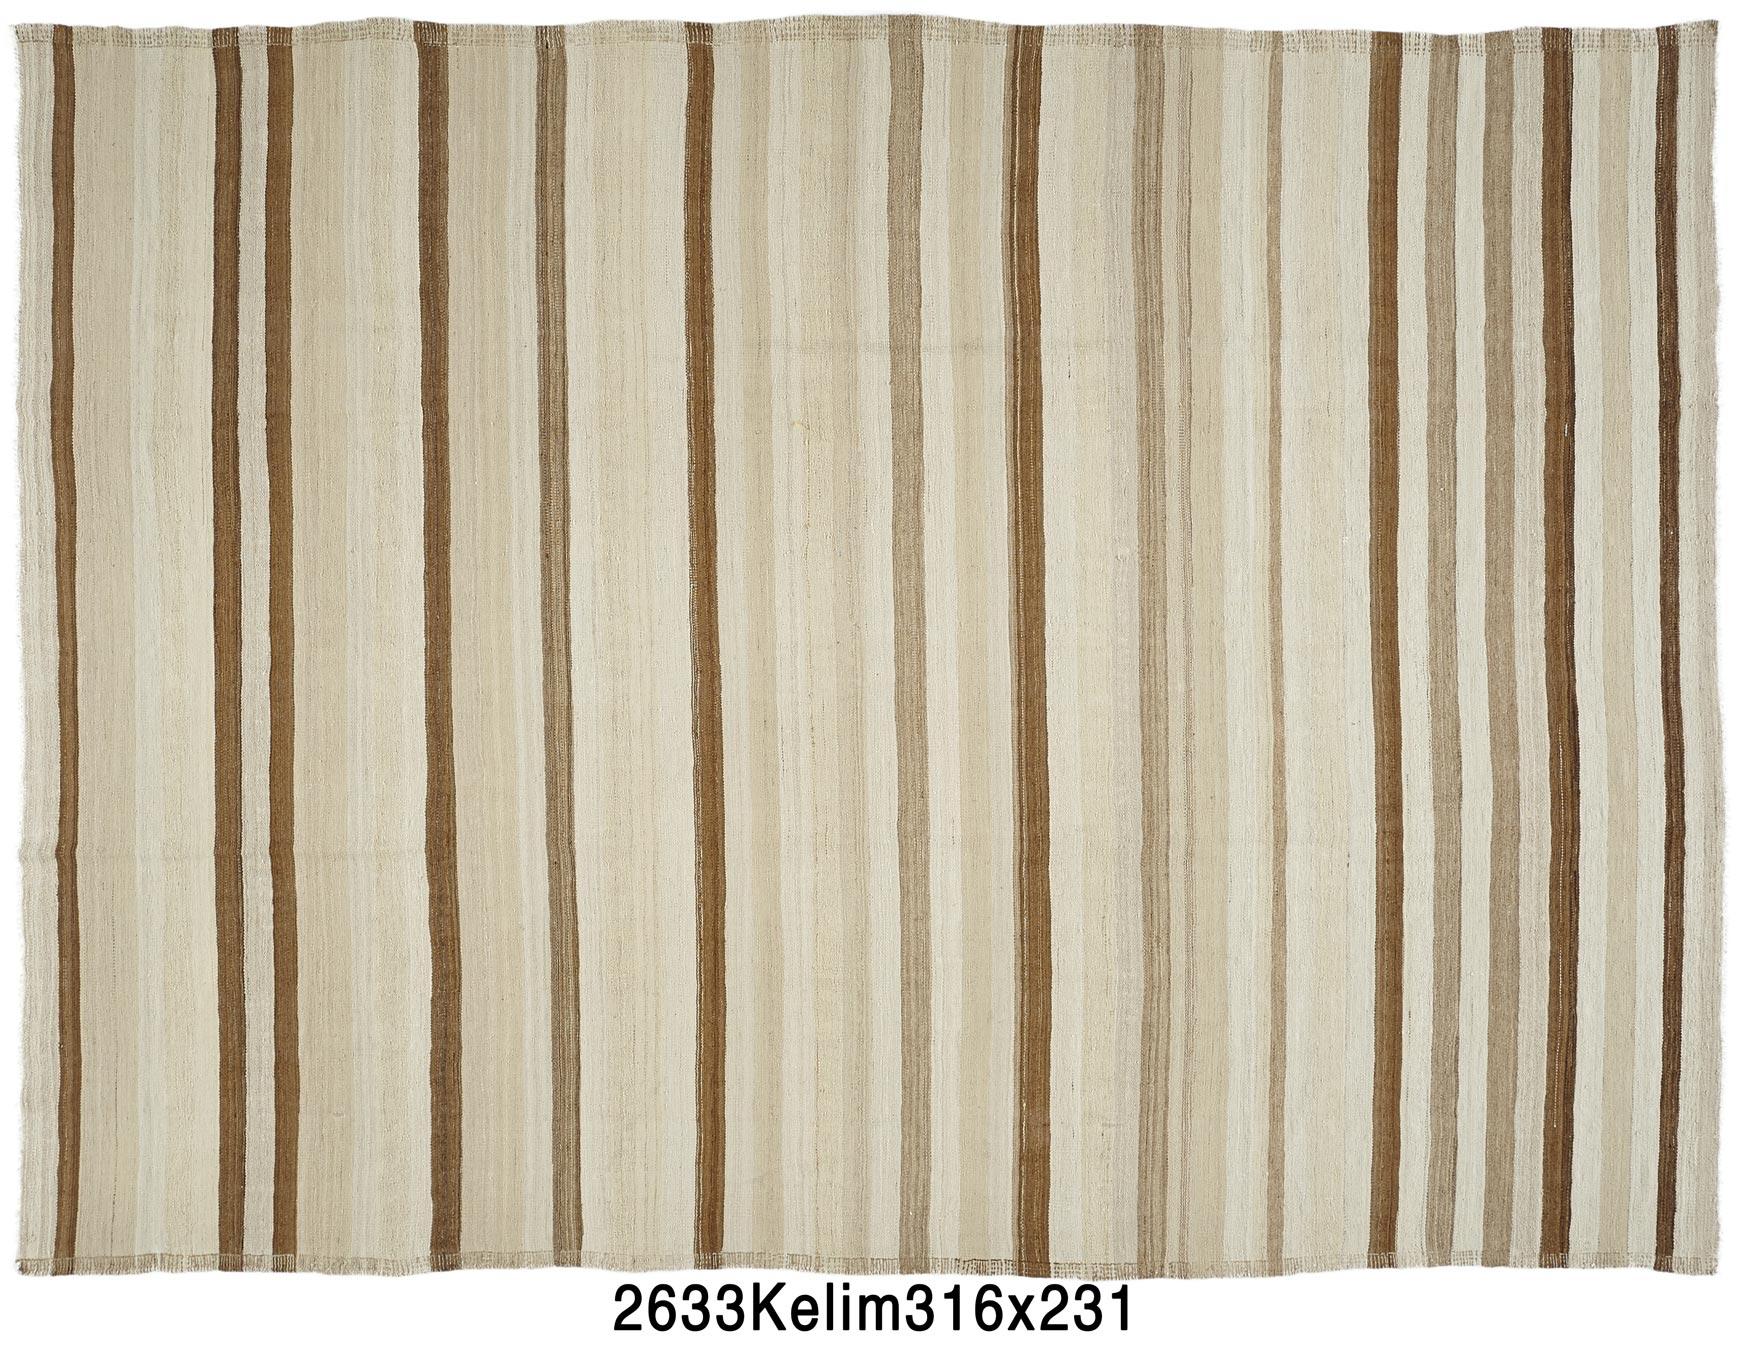 2633 kelim 316x231 ariana rugs. Black Bedroom Furniture Sets. Home Design Ideas